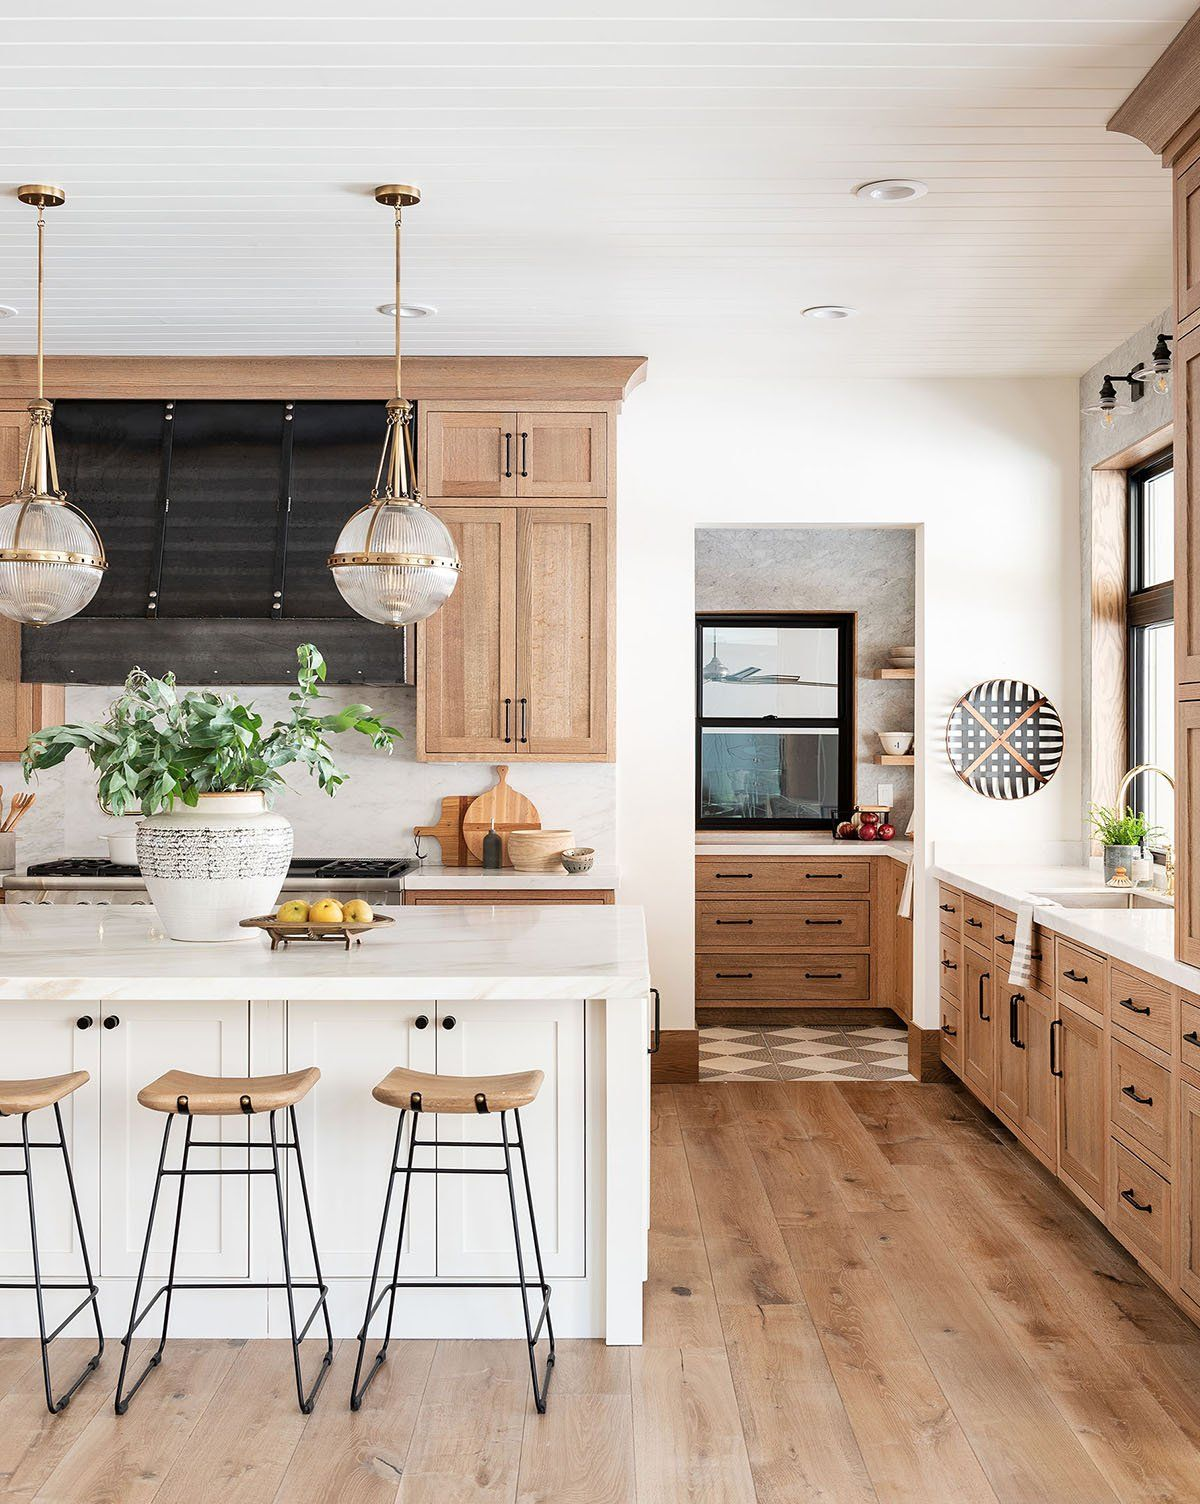 Osaka Urn Large In 2020 Wooden Kitchen Cabinets Natural Wood Kitchen Latest Kitchen Designs